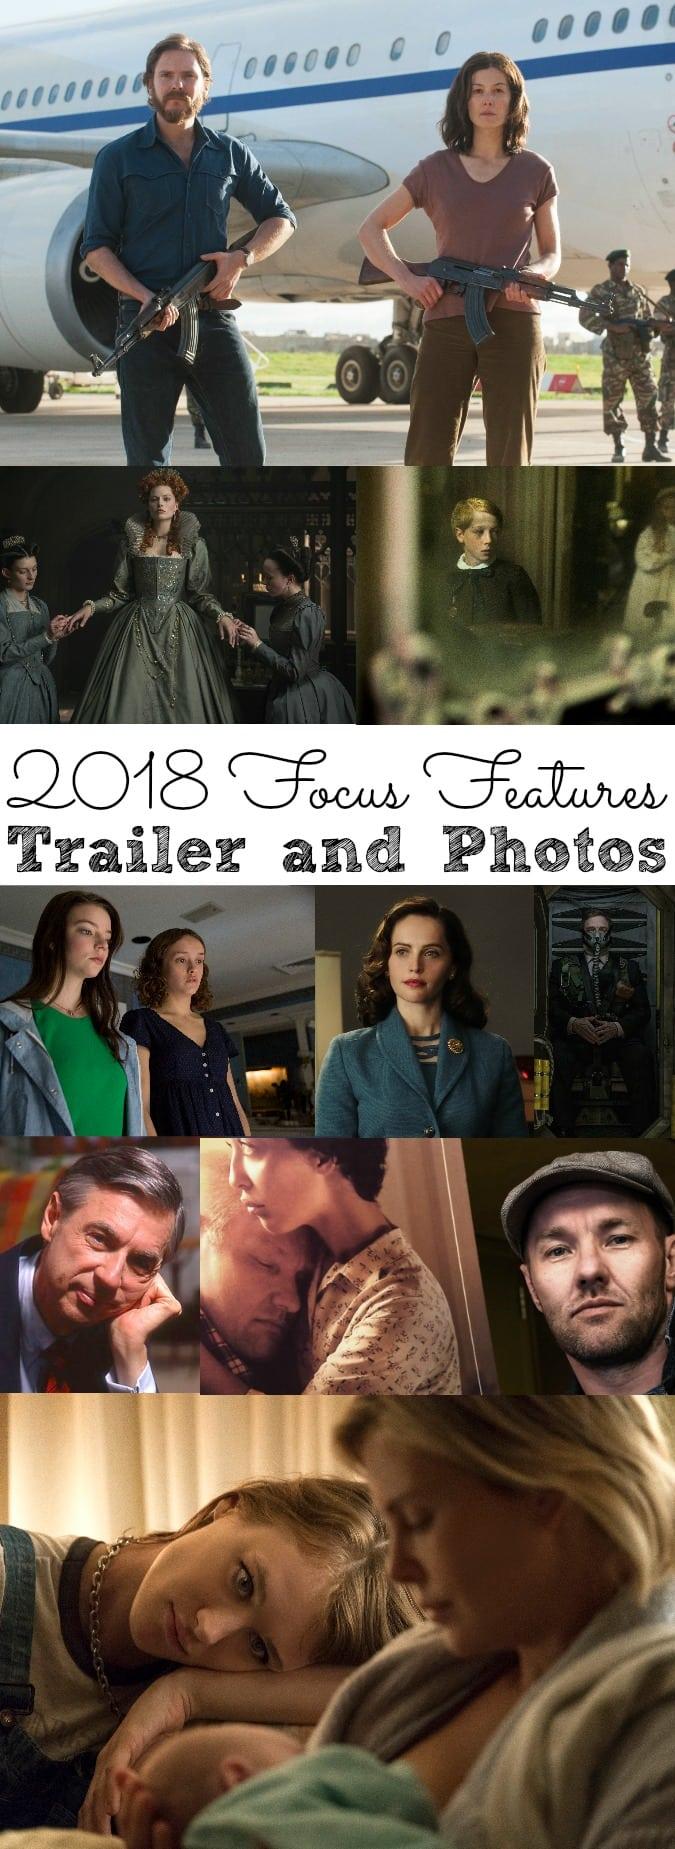 2018 Focus Features Trailer and Photos - simplytodaylife.com